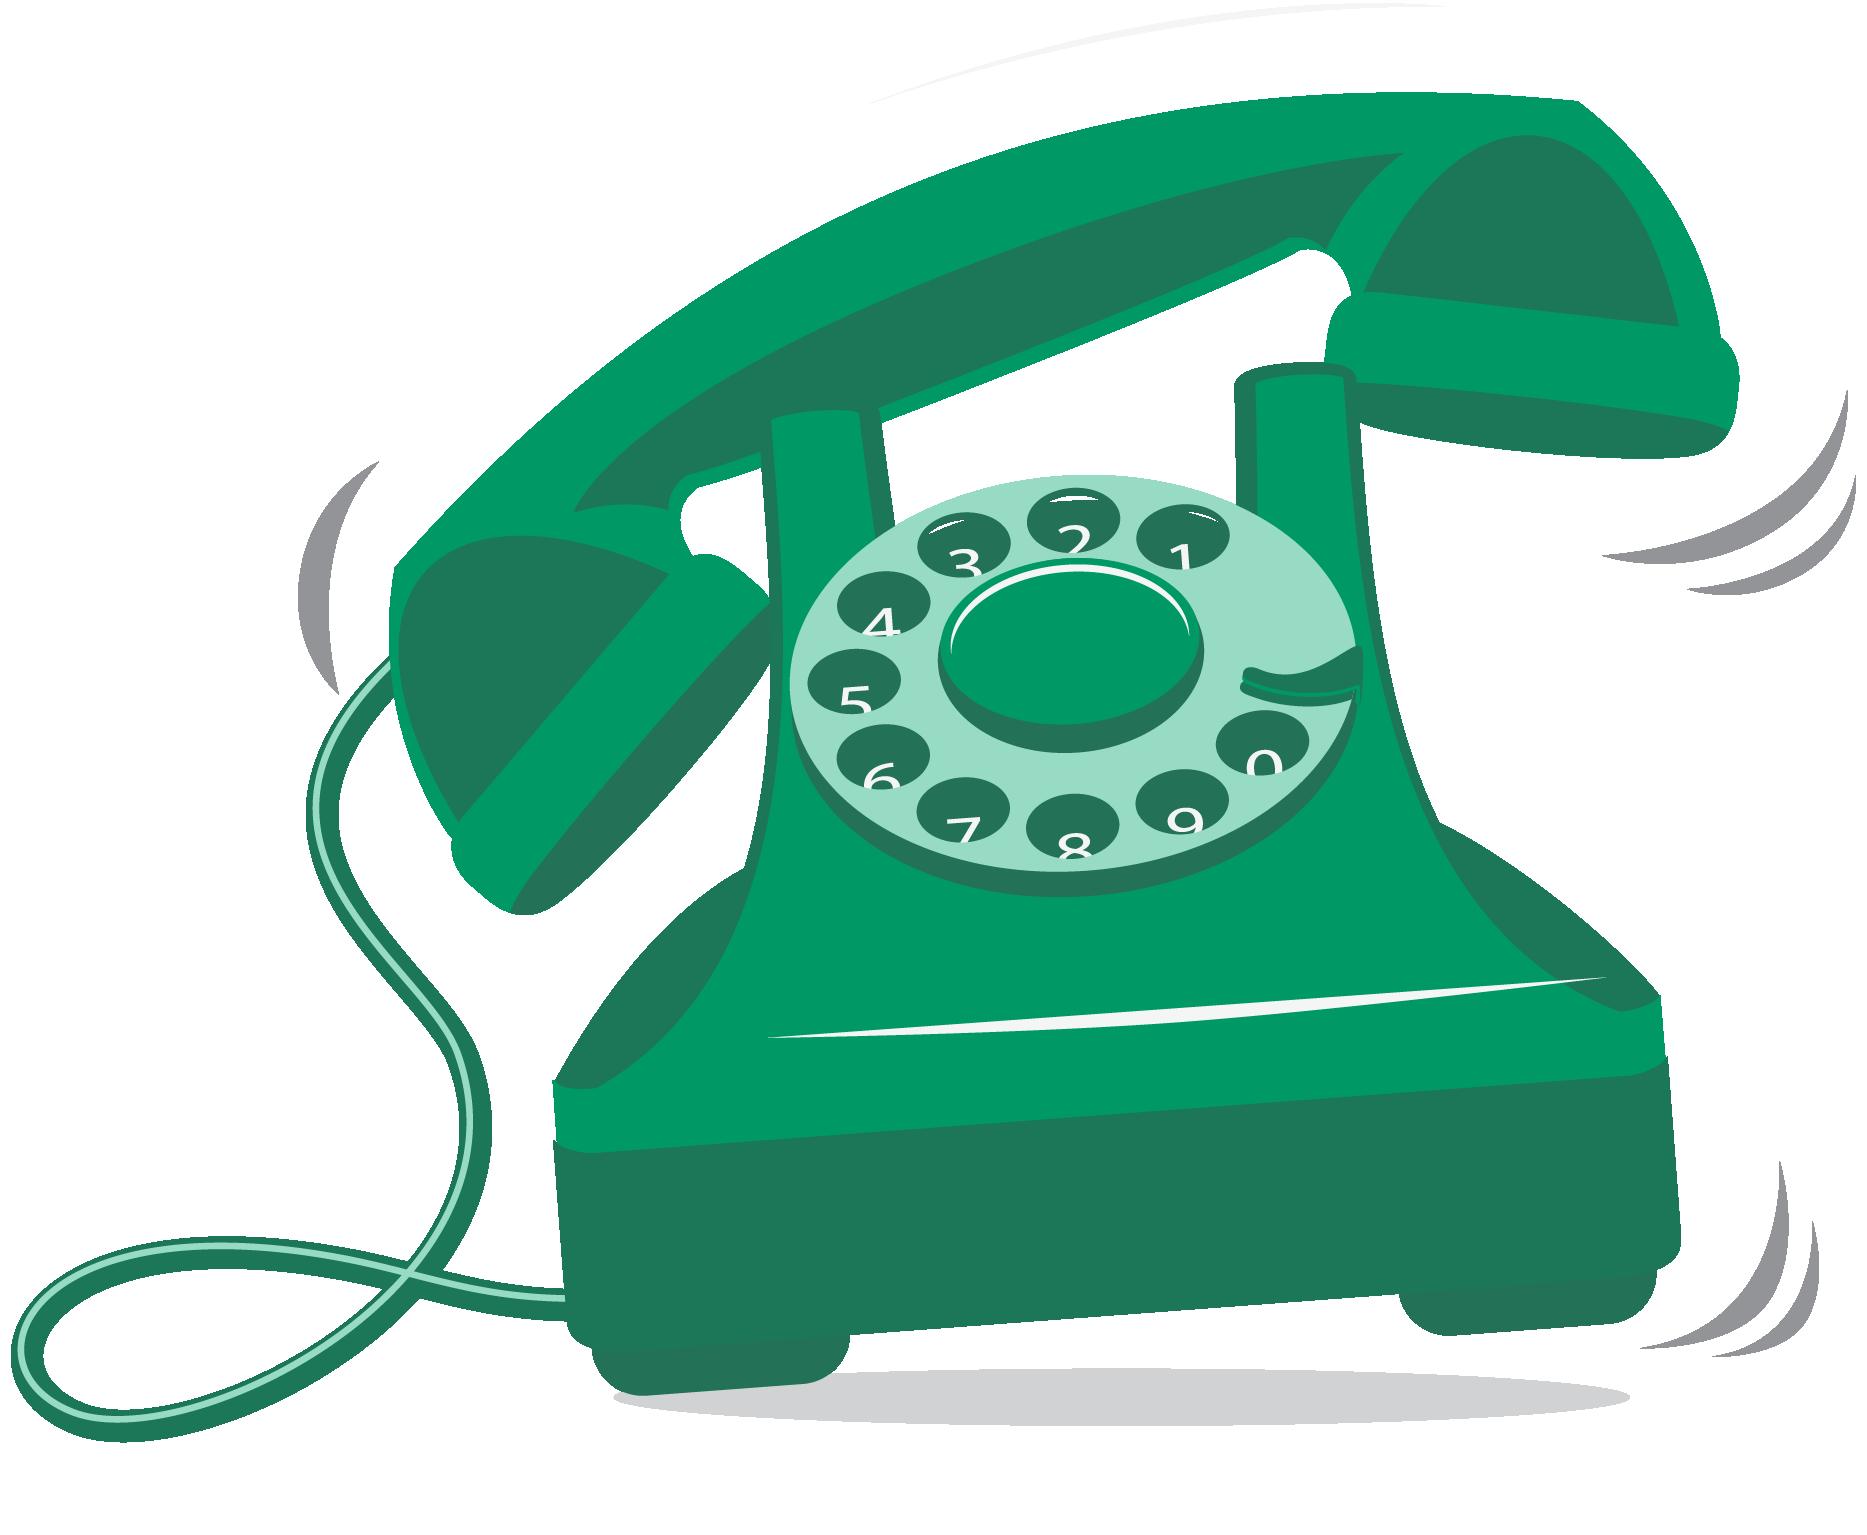 Icoon van een ouderwetse groene telefoon